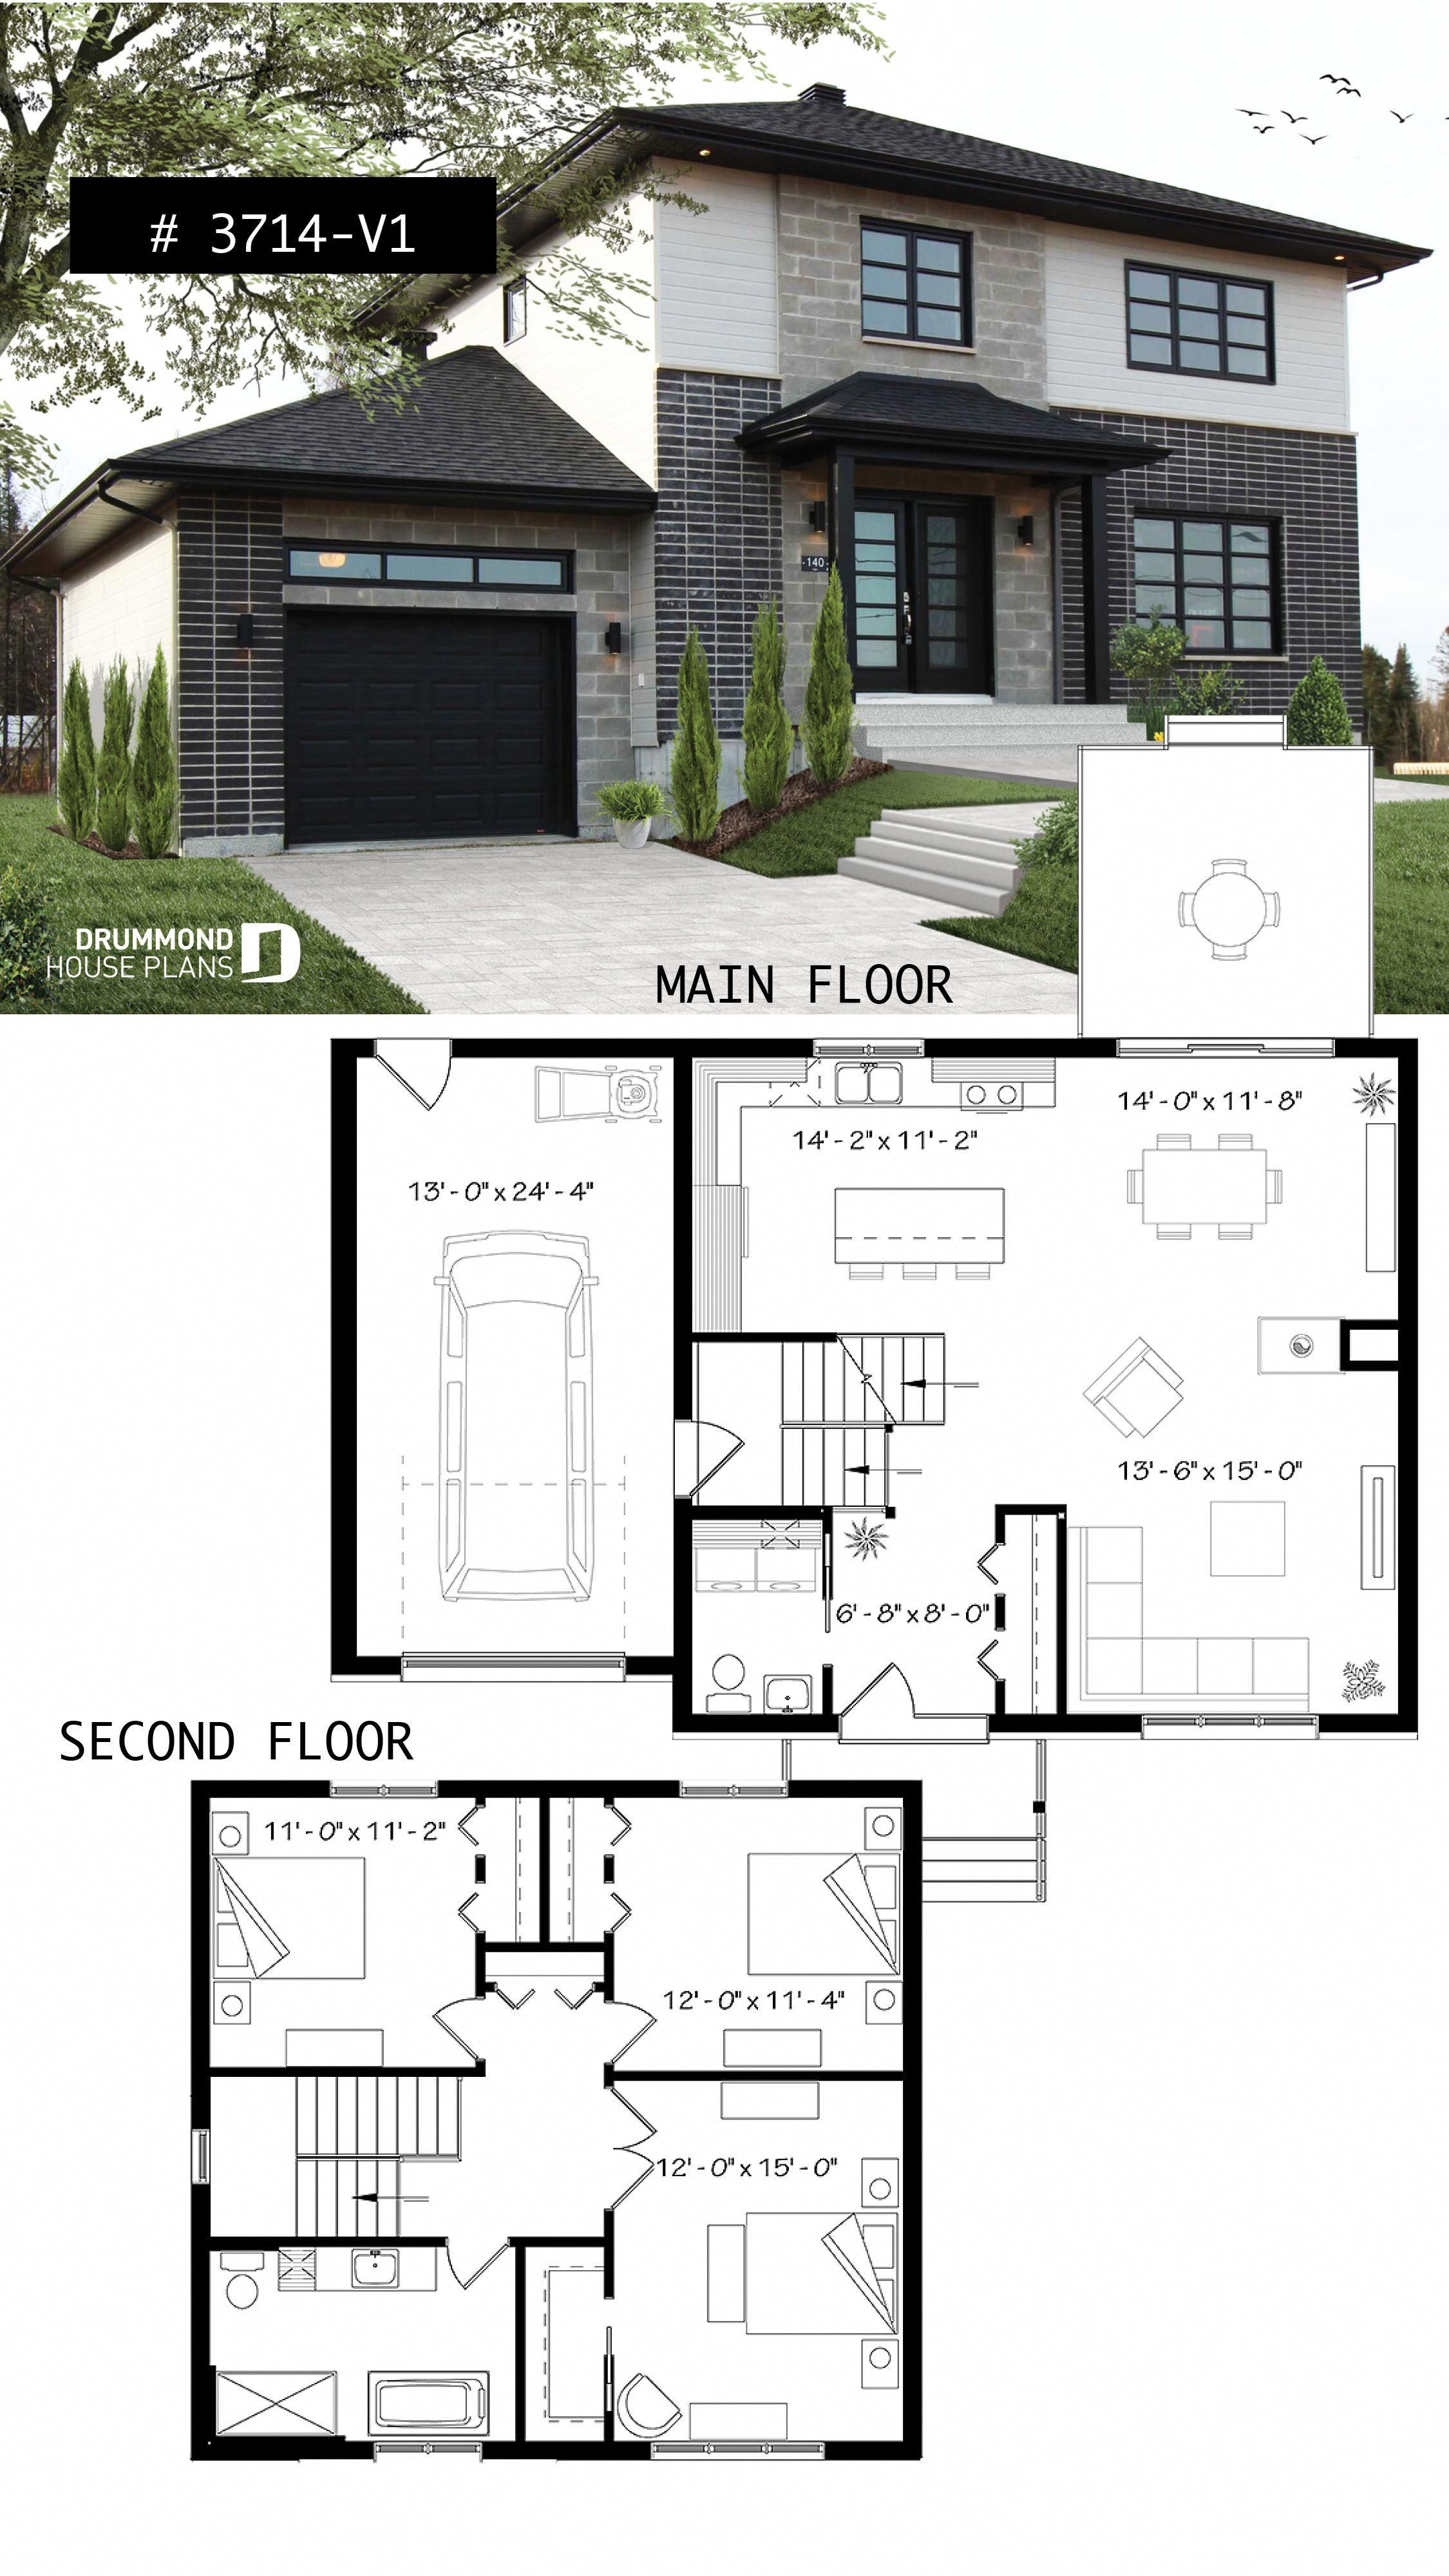 Bloxburg House Plans 2 Story - Hd Football